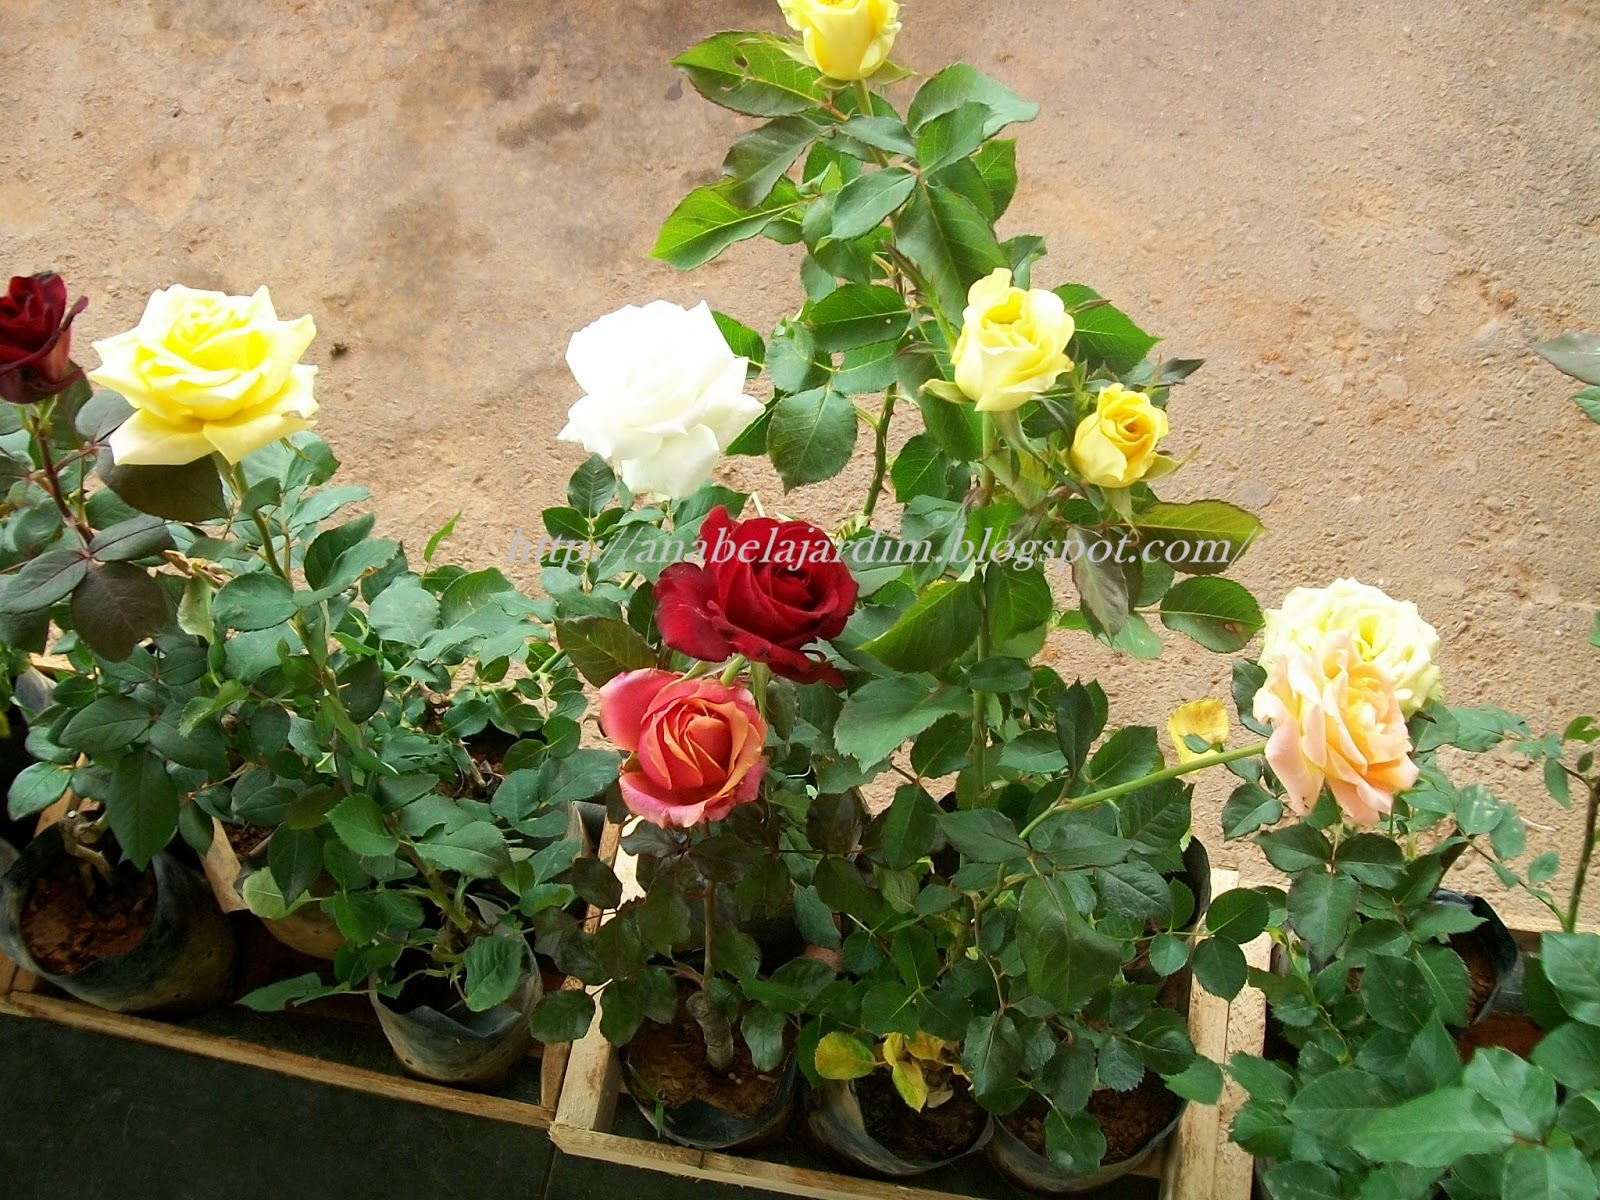 Extremamente Blog da Anabela Jardim: Made in Barbacena GD32